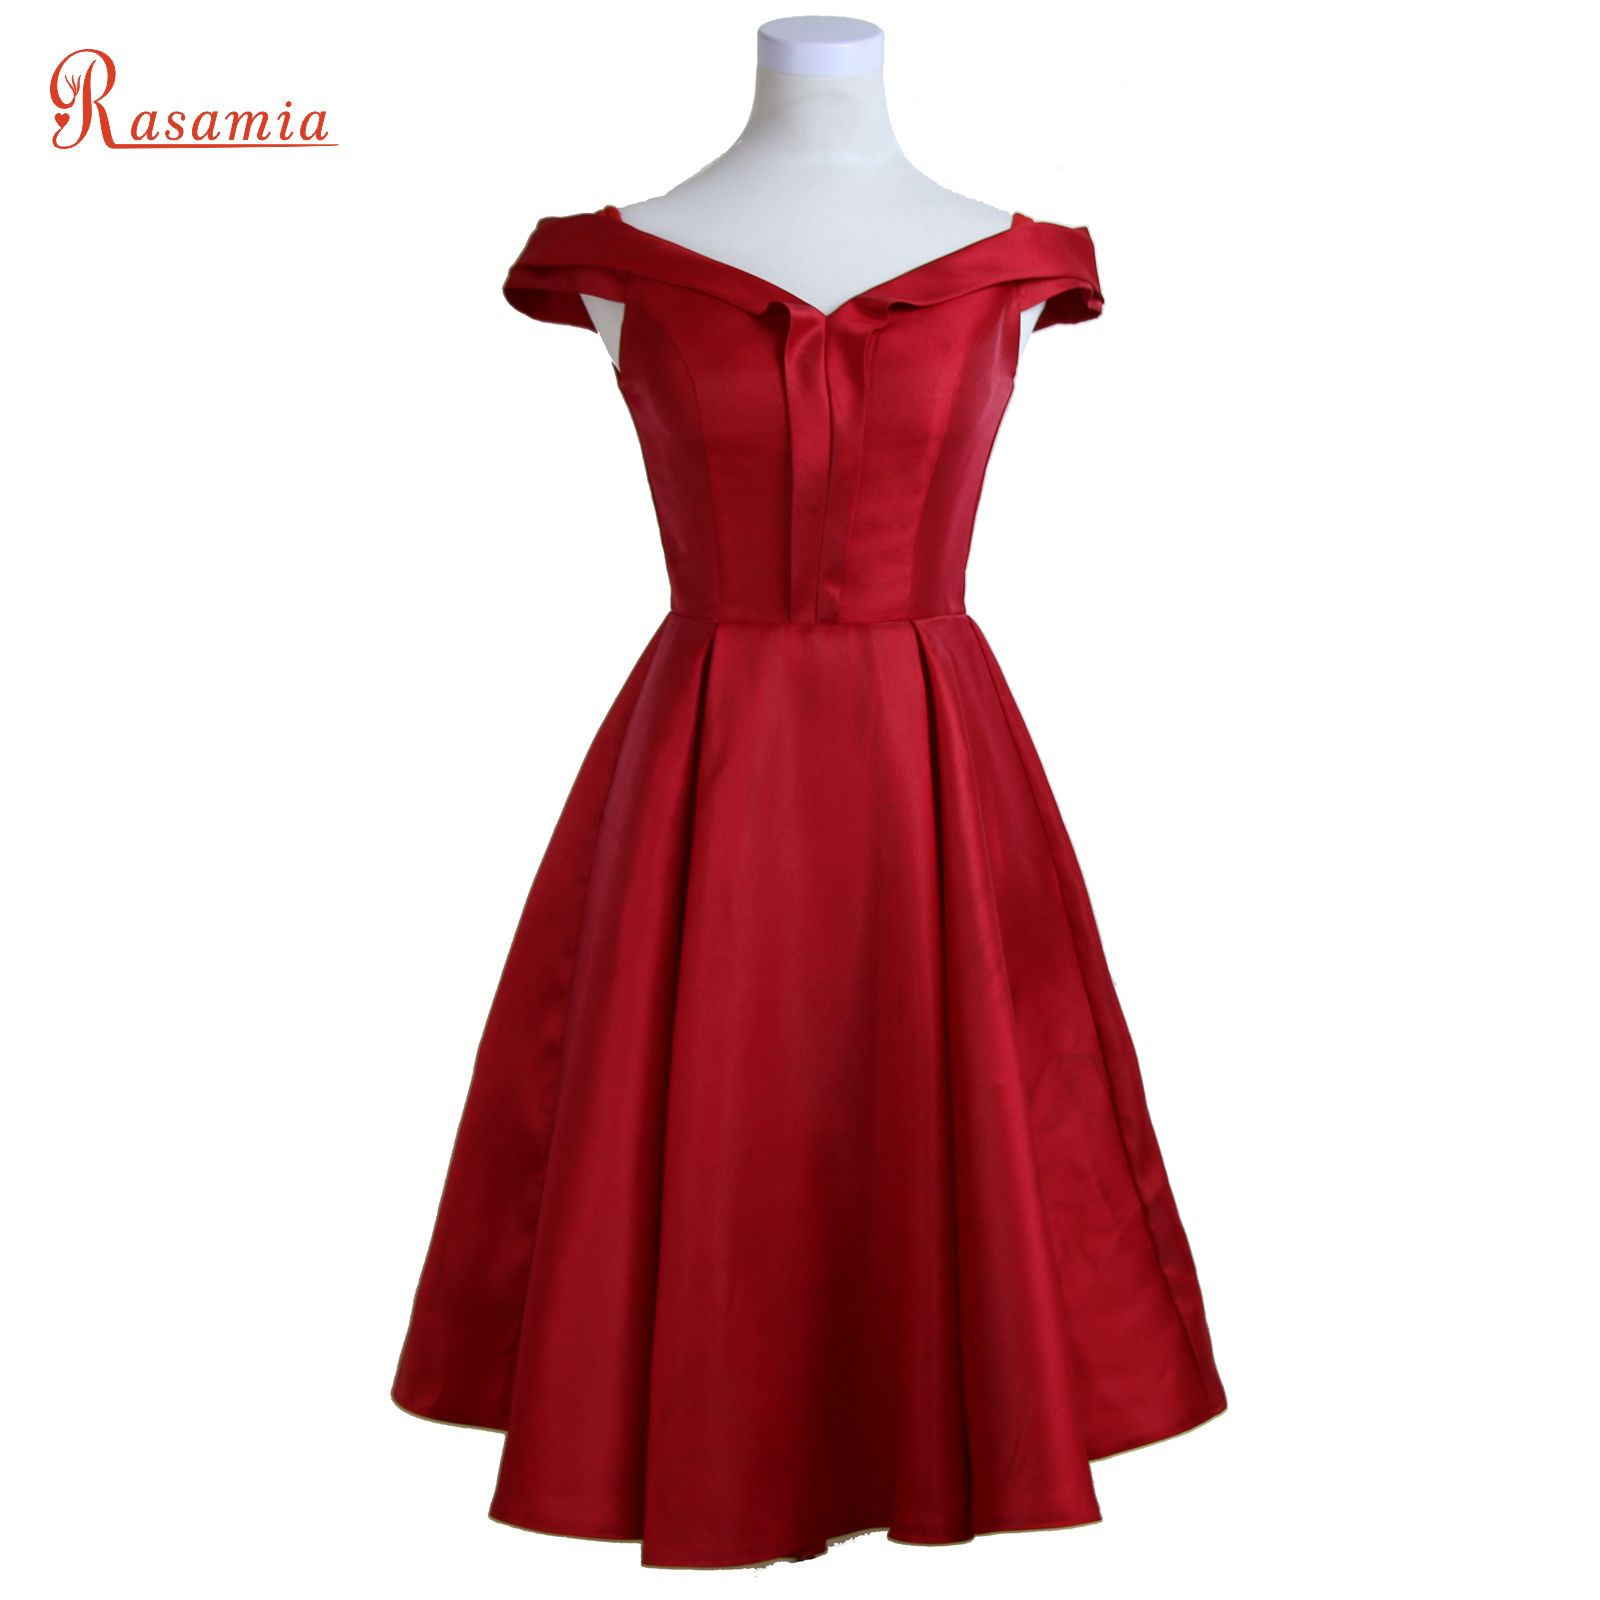 Red satin v neck evening dresses elegant vestidos prom dresses short